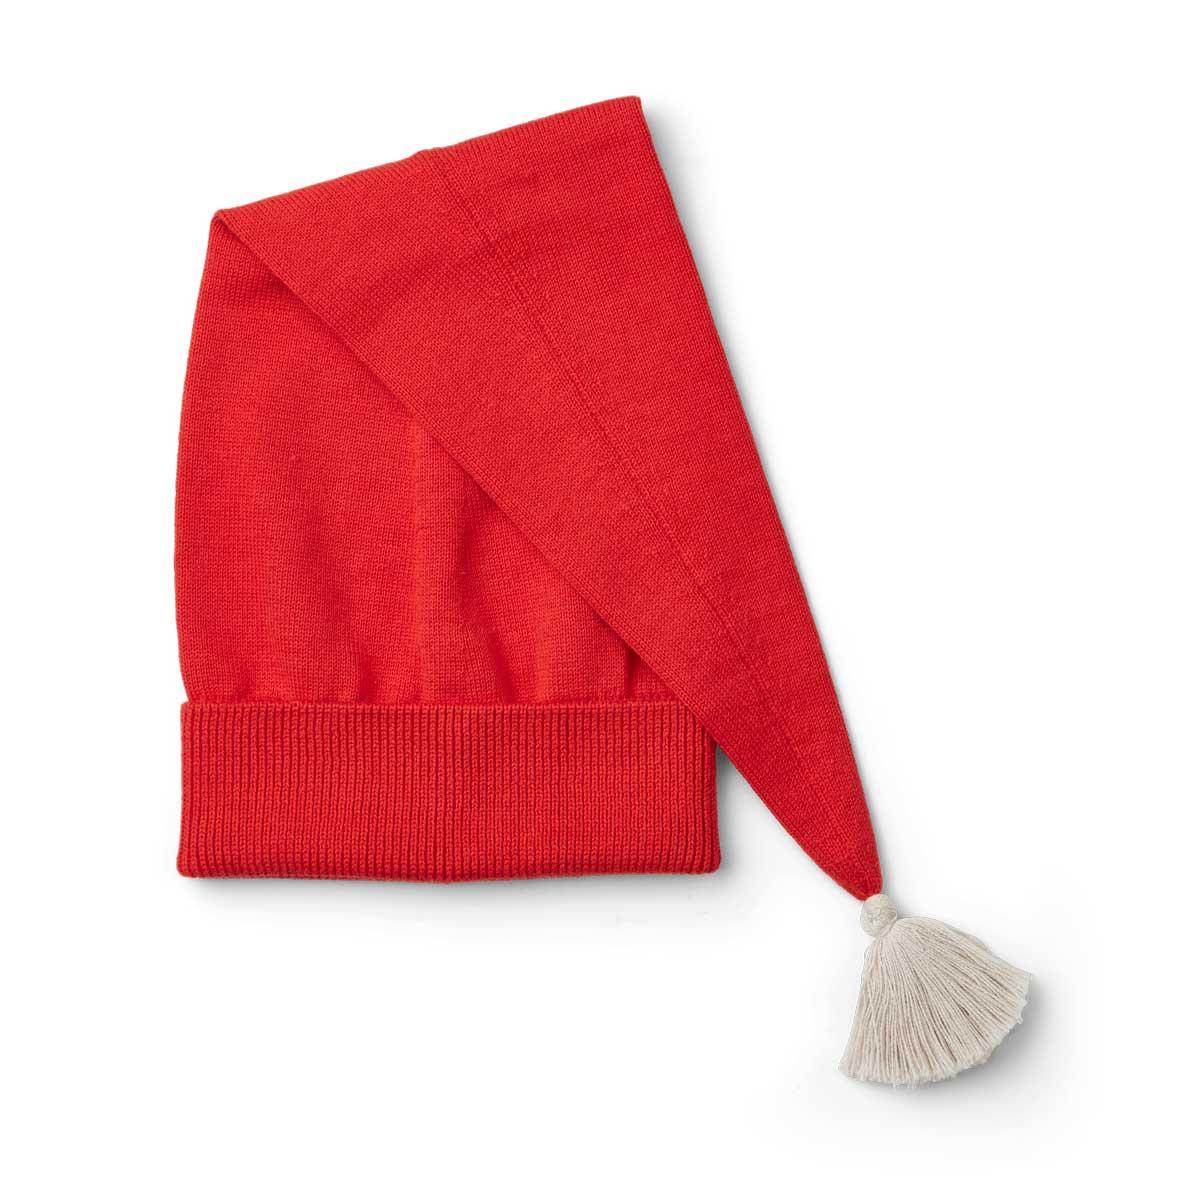 LIEWOOD Christmas hat